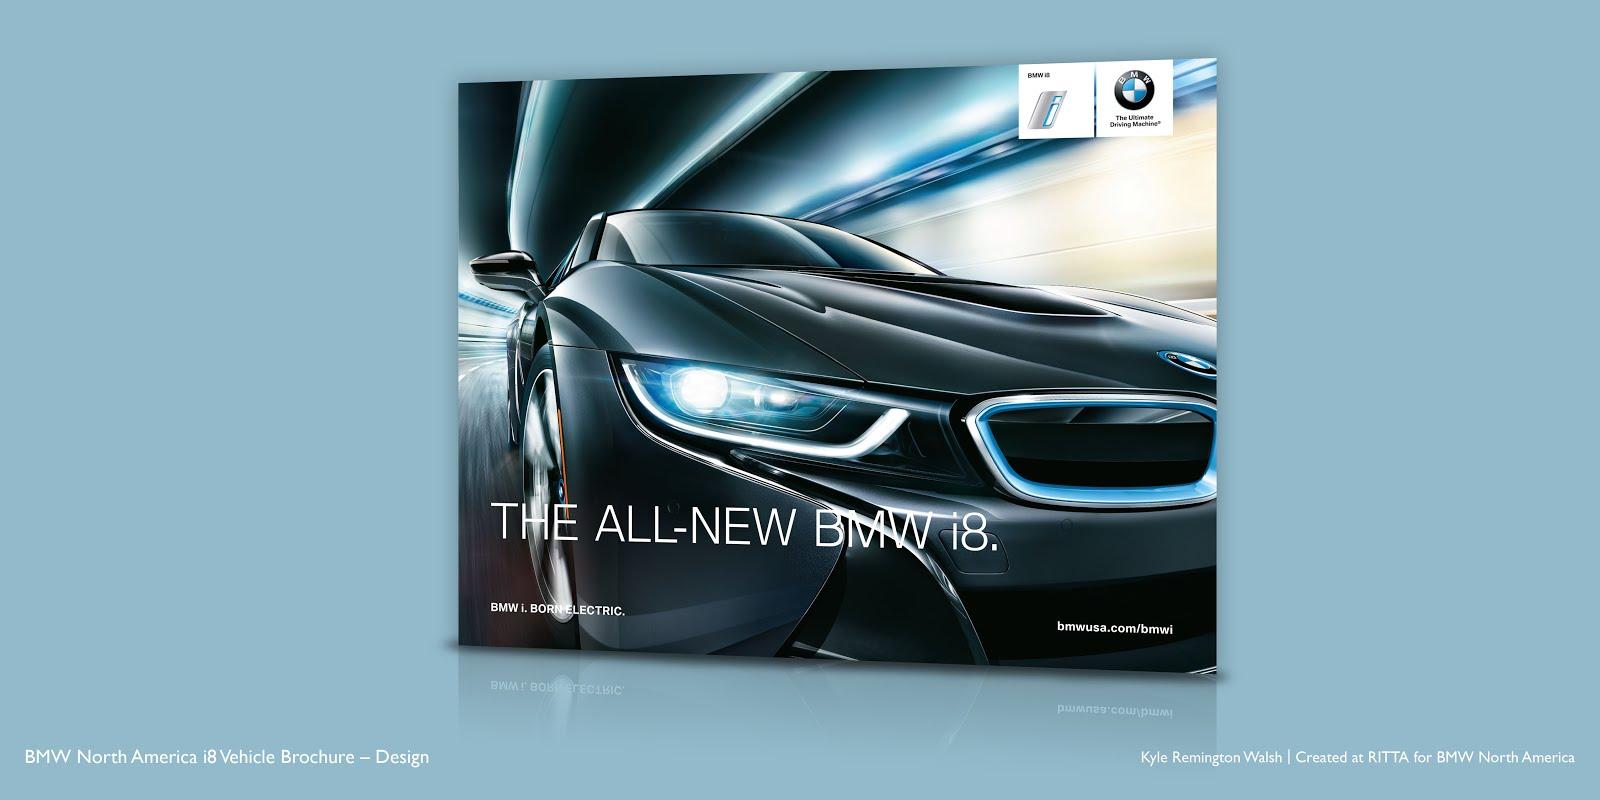 kyle walsh portfolio: BMW North America